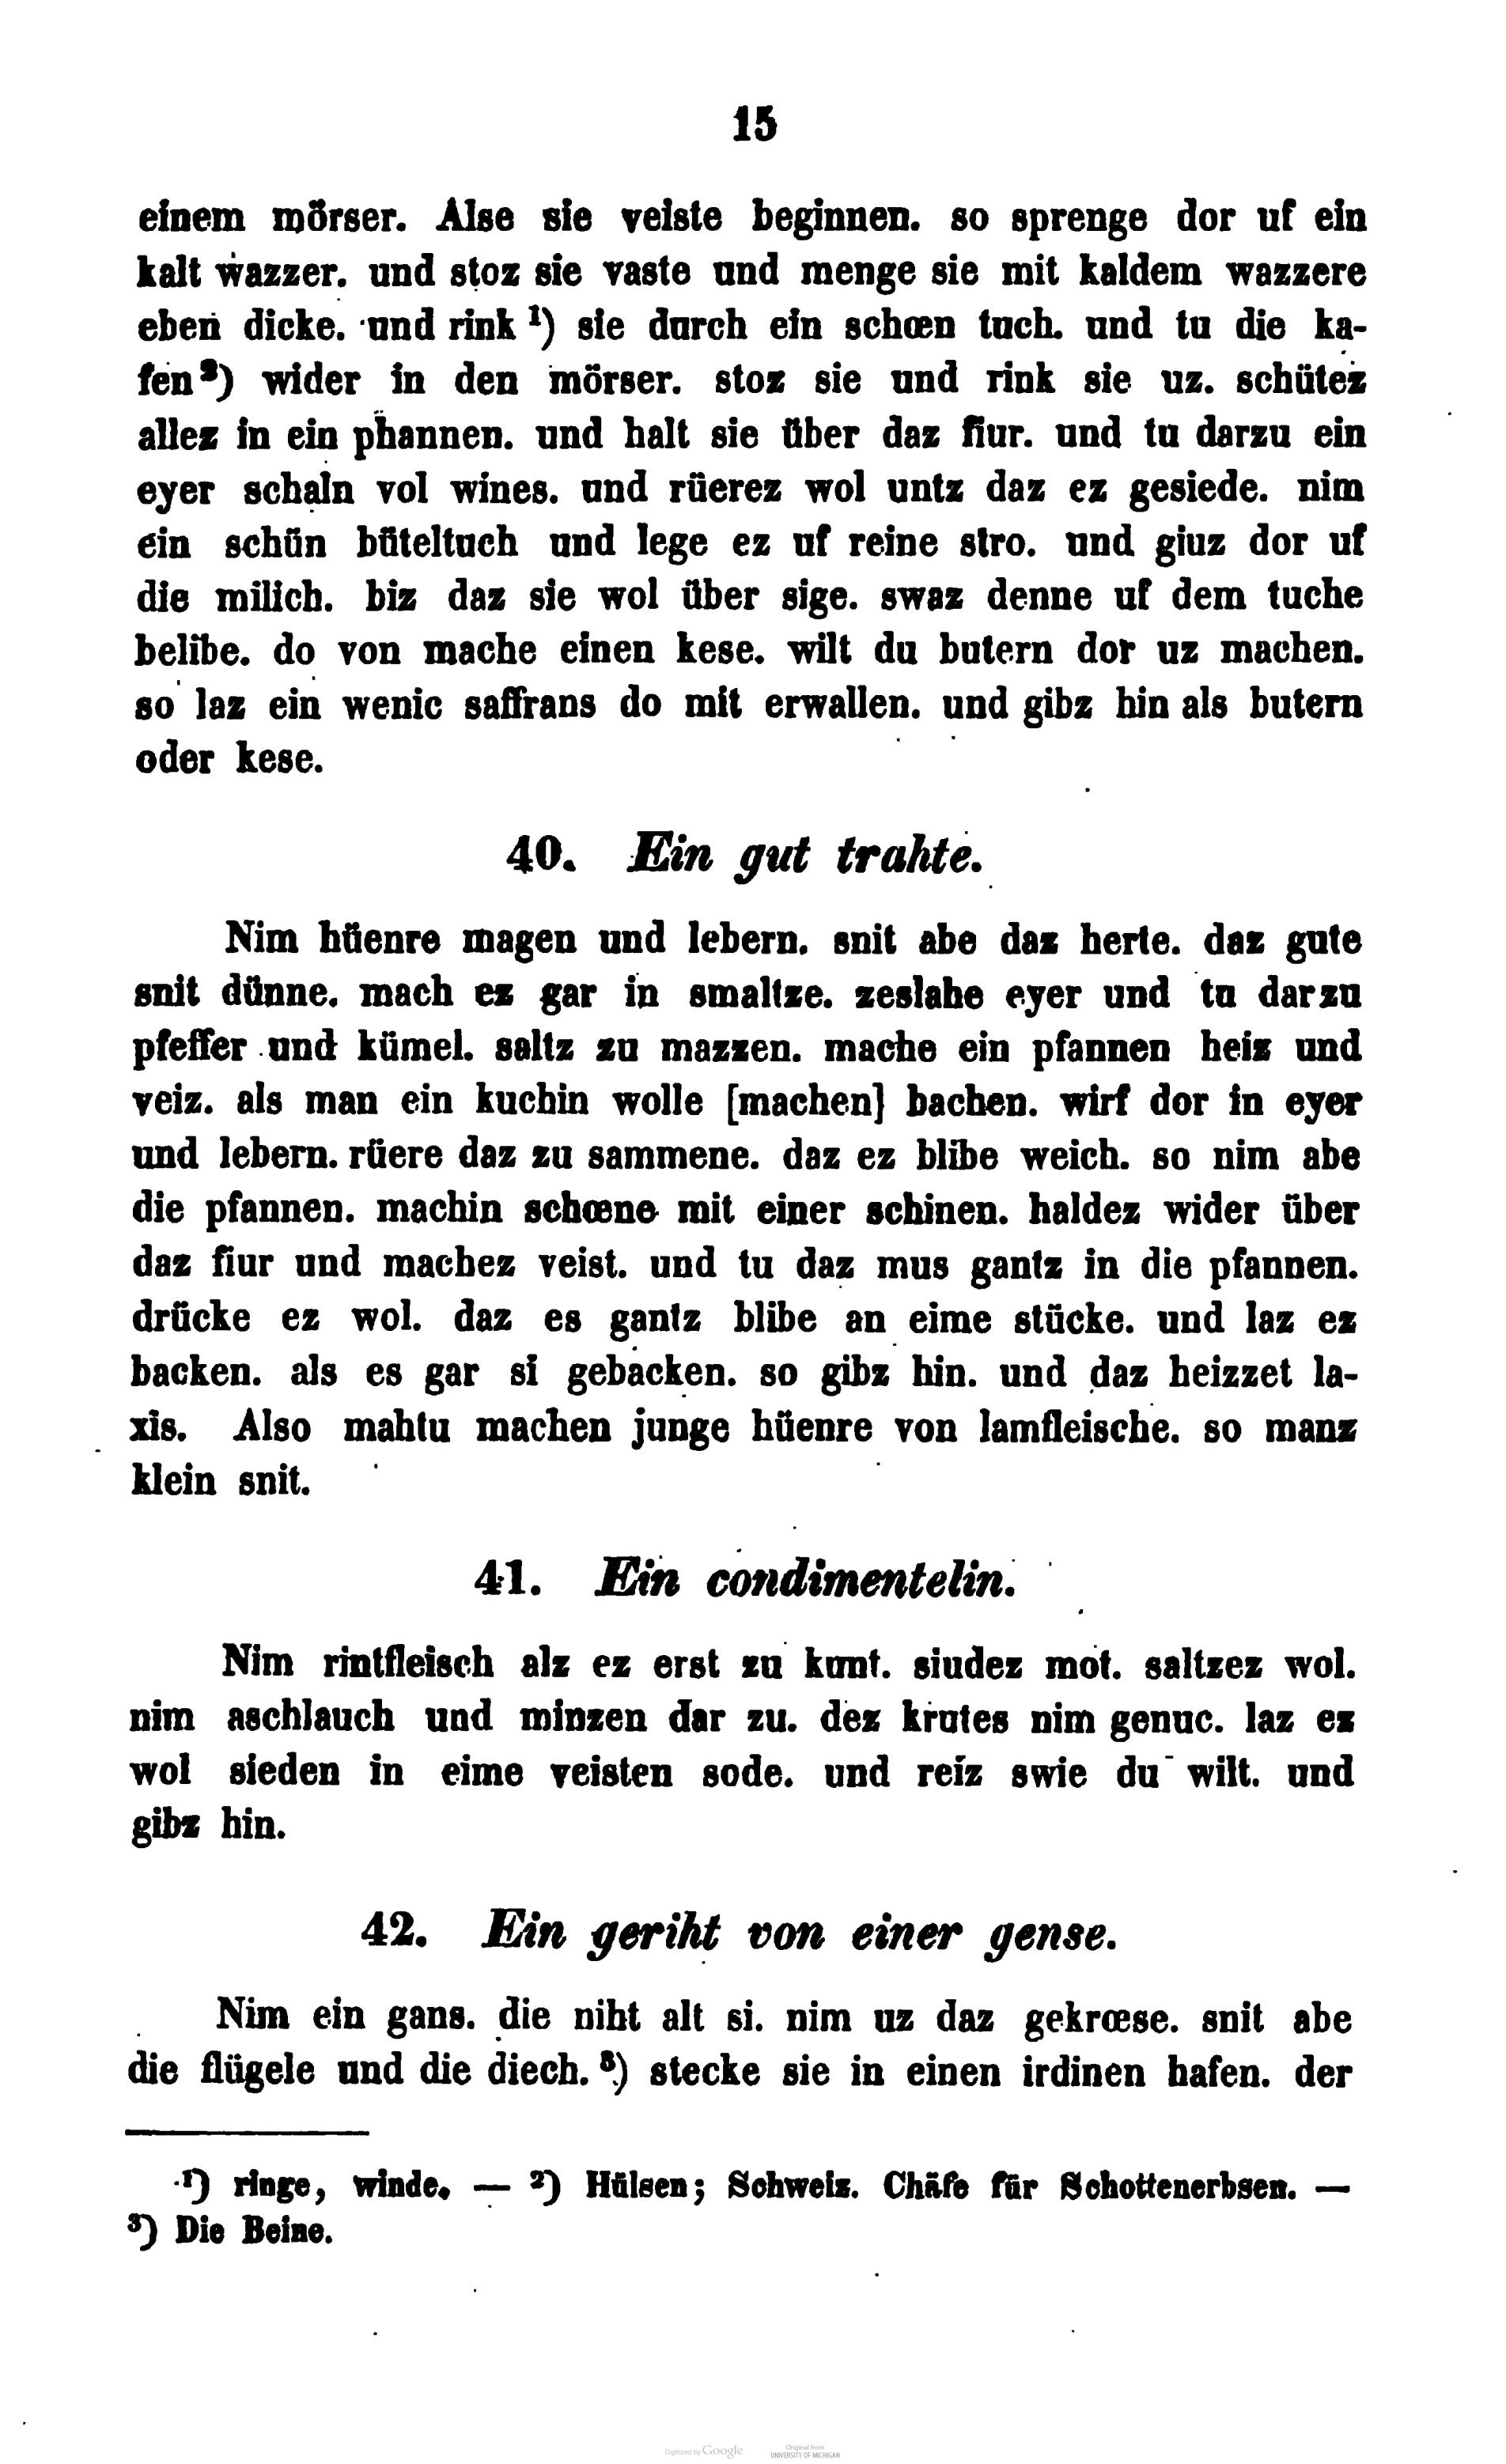 File:Literarischer Verein Stuttgart IX 052.png - Wikimedia Commons